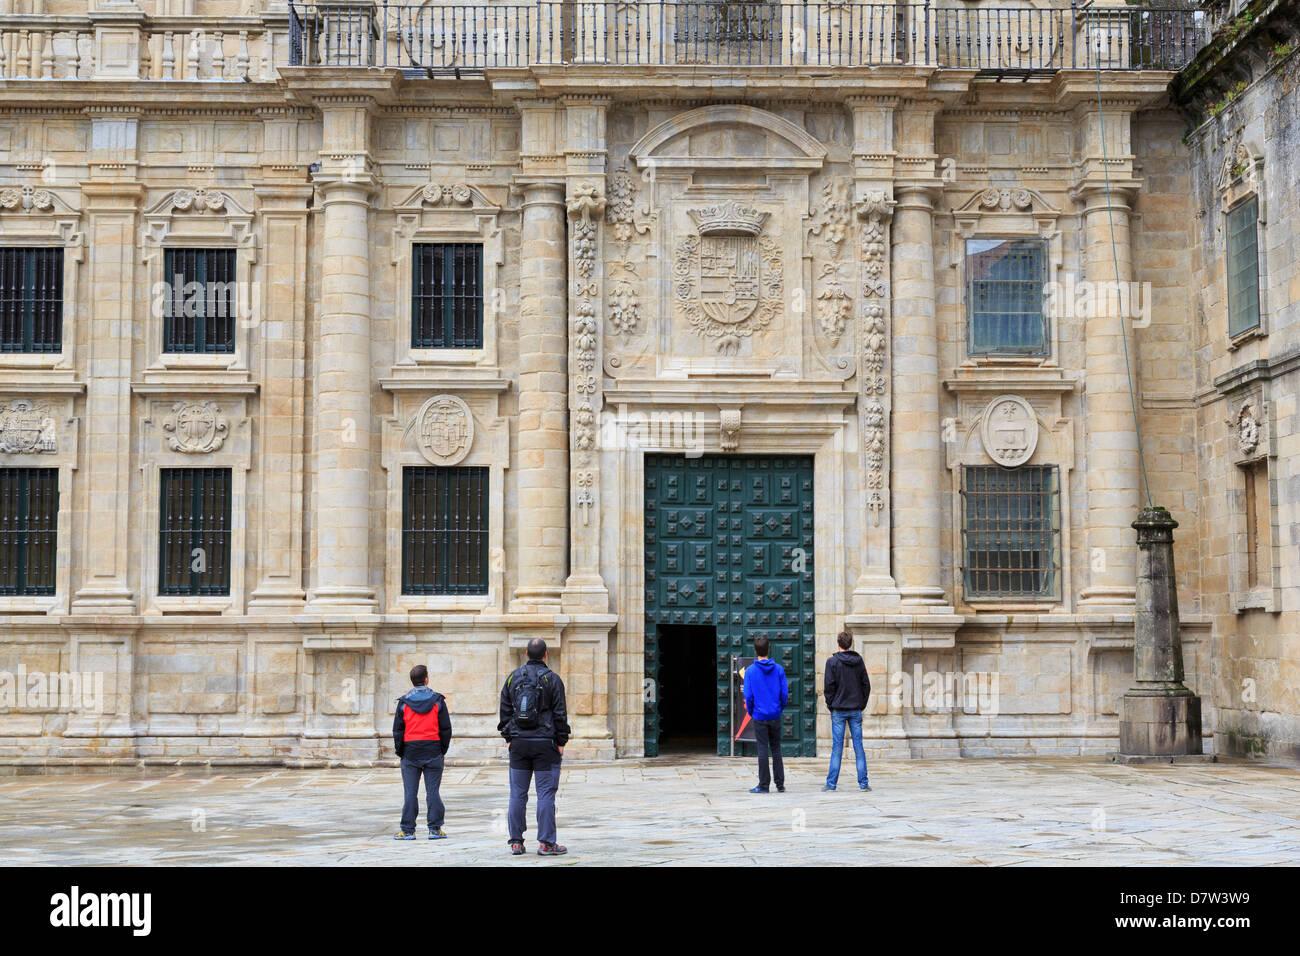 Dom Eingang am Plaza Quintana, Santiago De Compostela, UNESCO World Heritage Site, Galicien, Spanien Stockbild